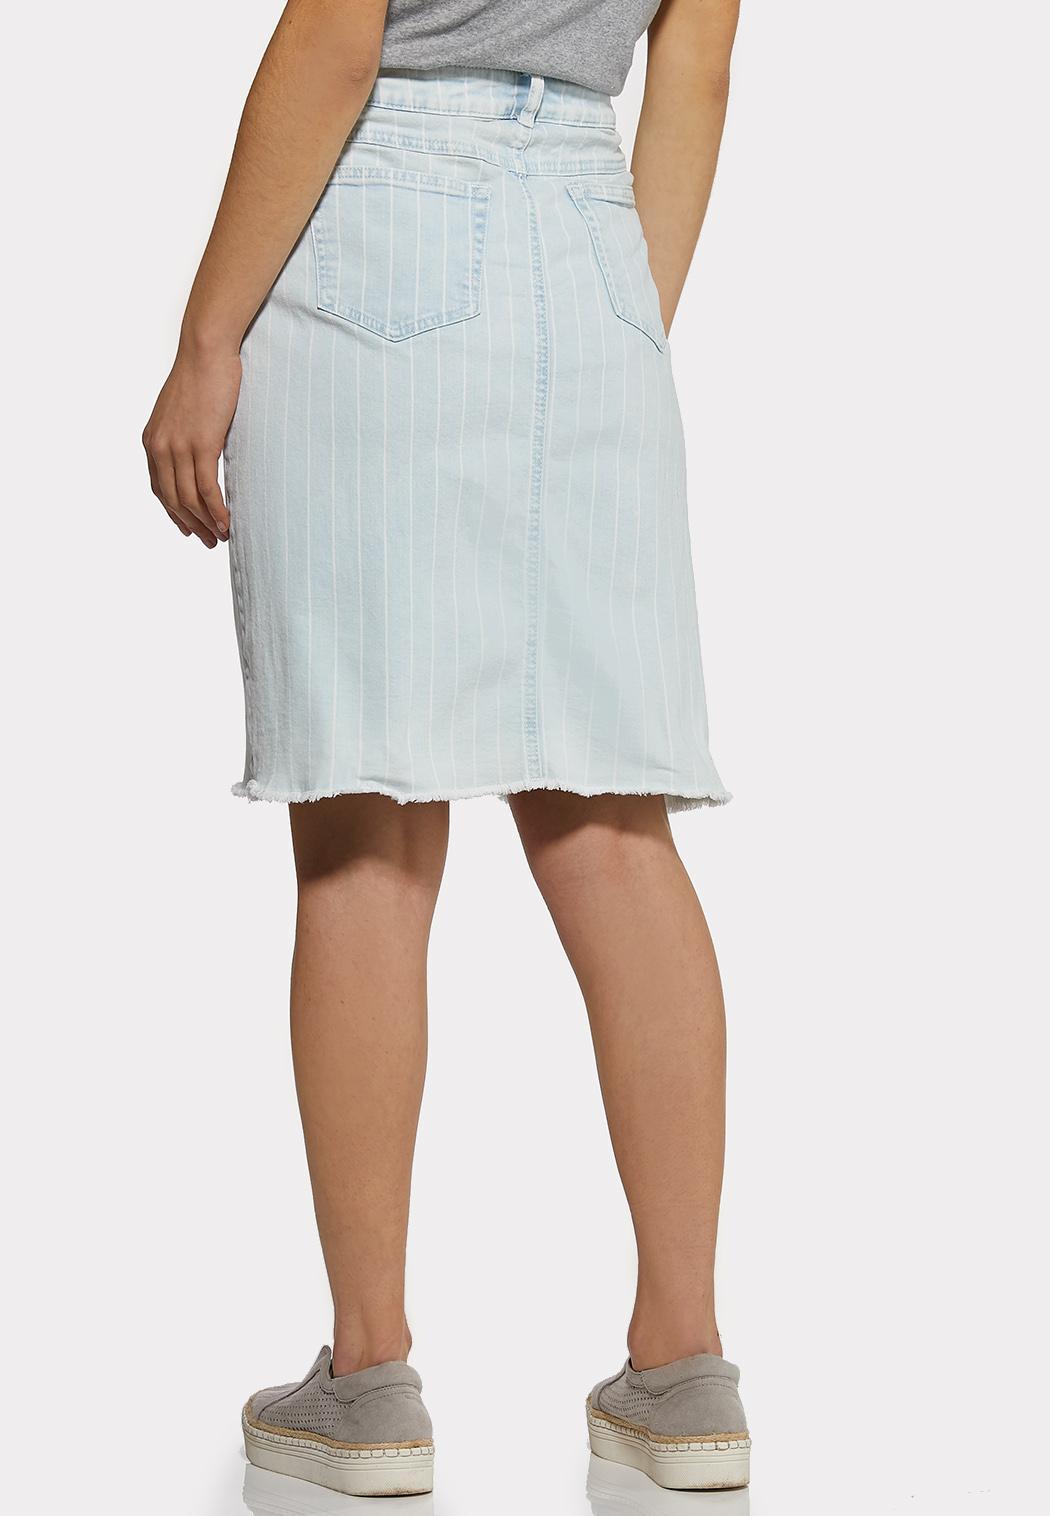 Plus Size Striped Light Wash Denim Skirt (Item #44203960)